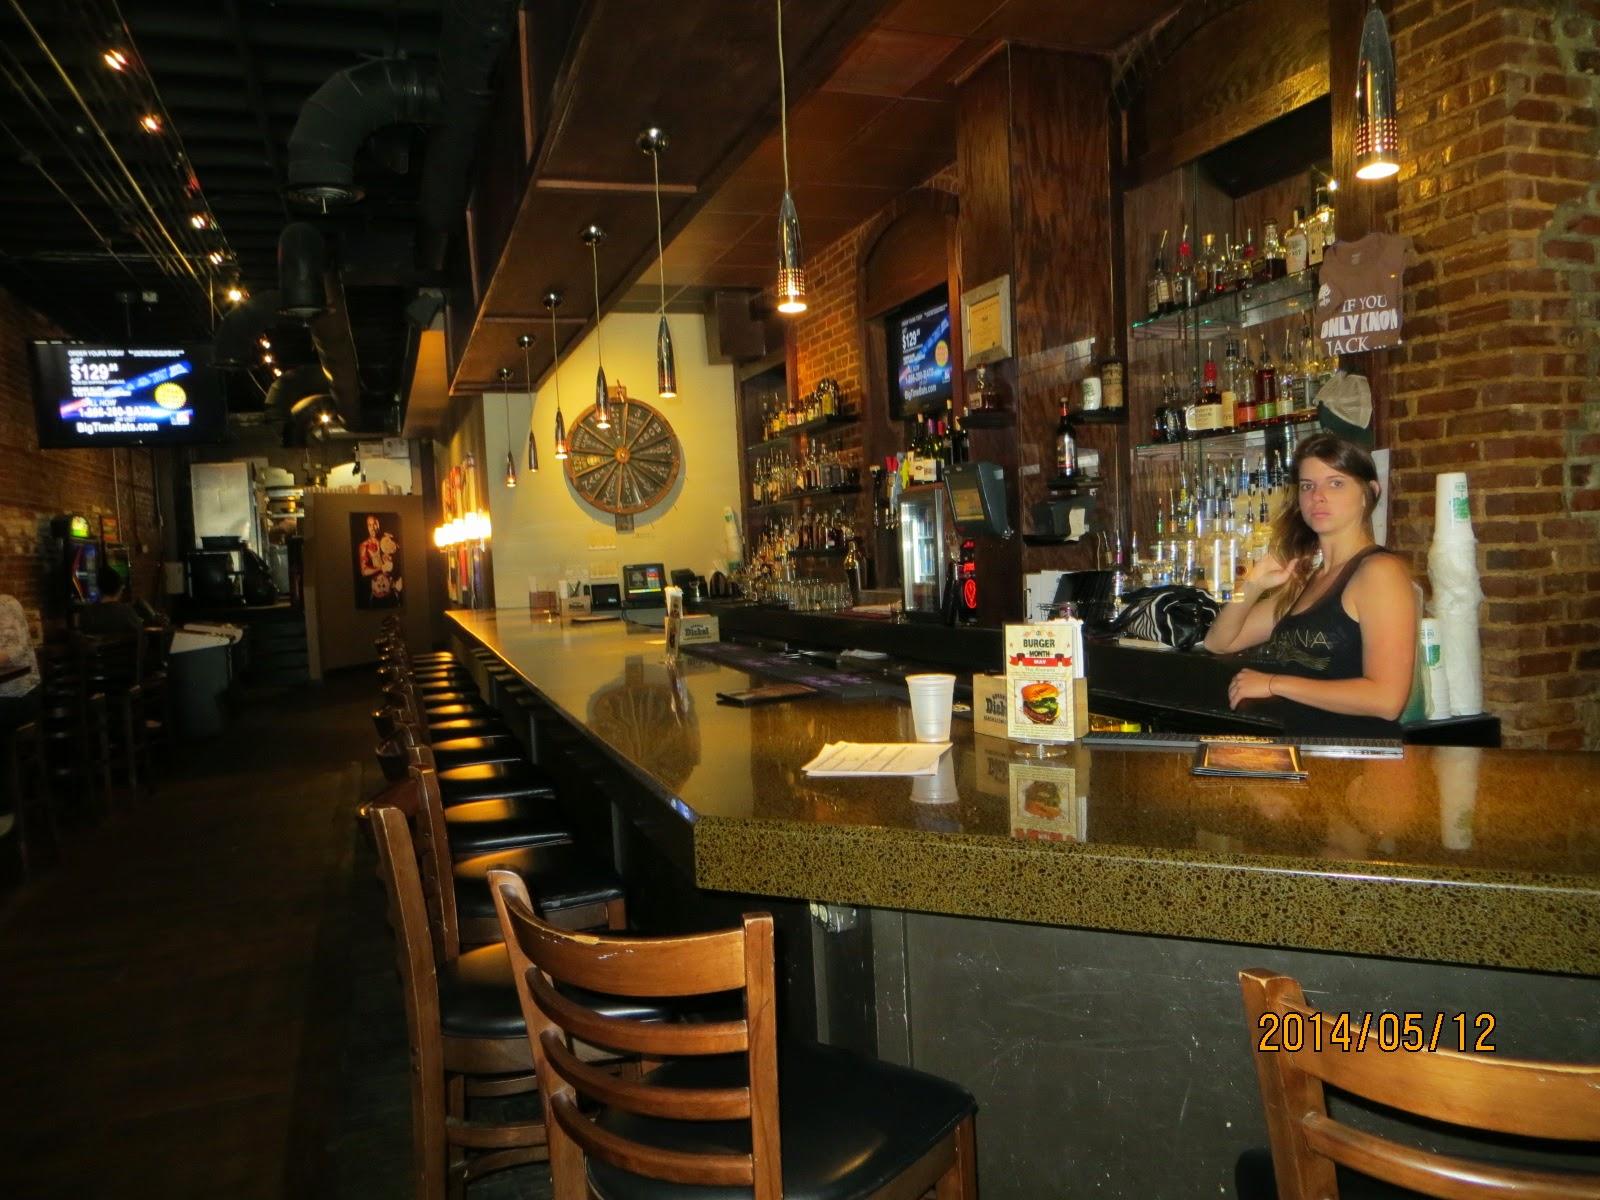 Jeeps Pubs Taverns And Bars Park Bar Atlanta Georgia